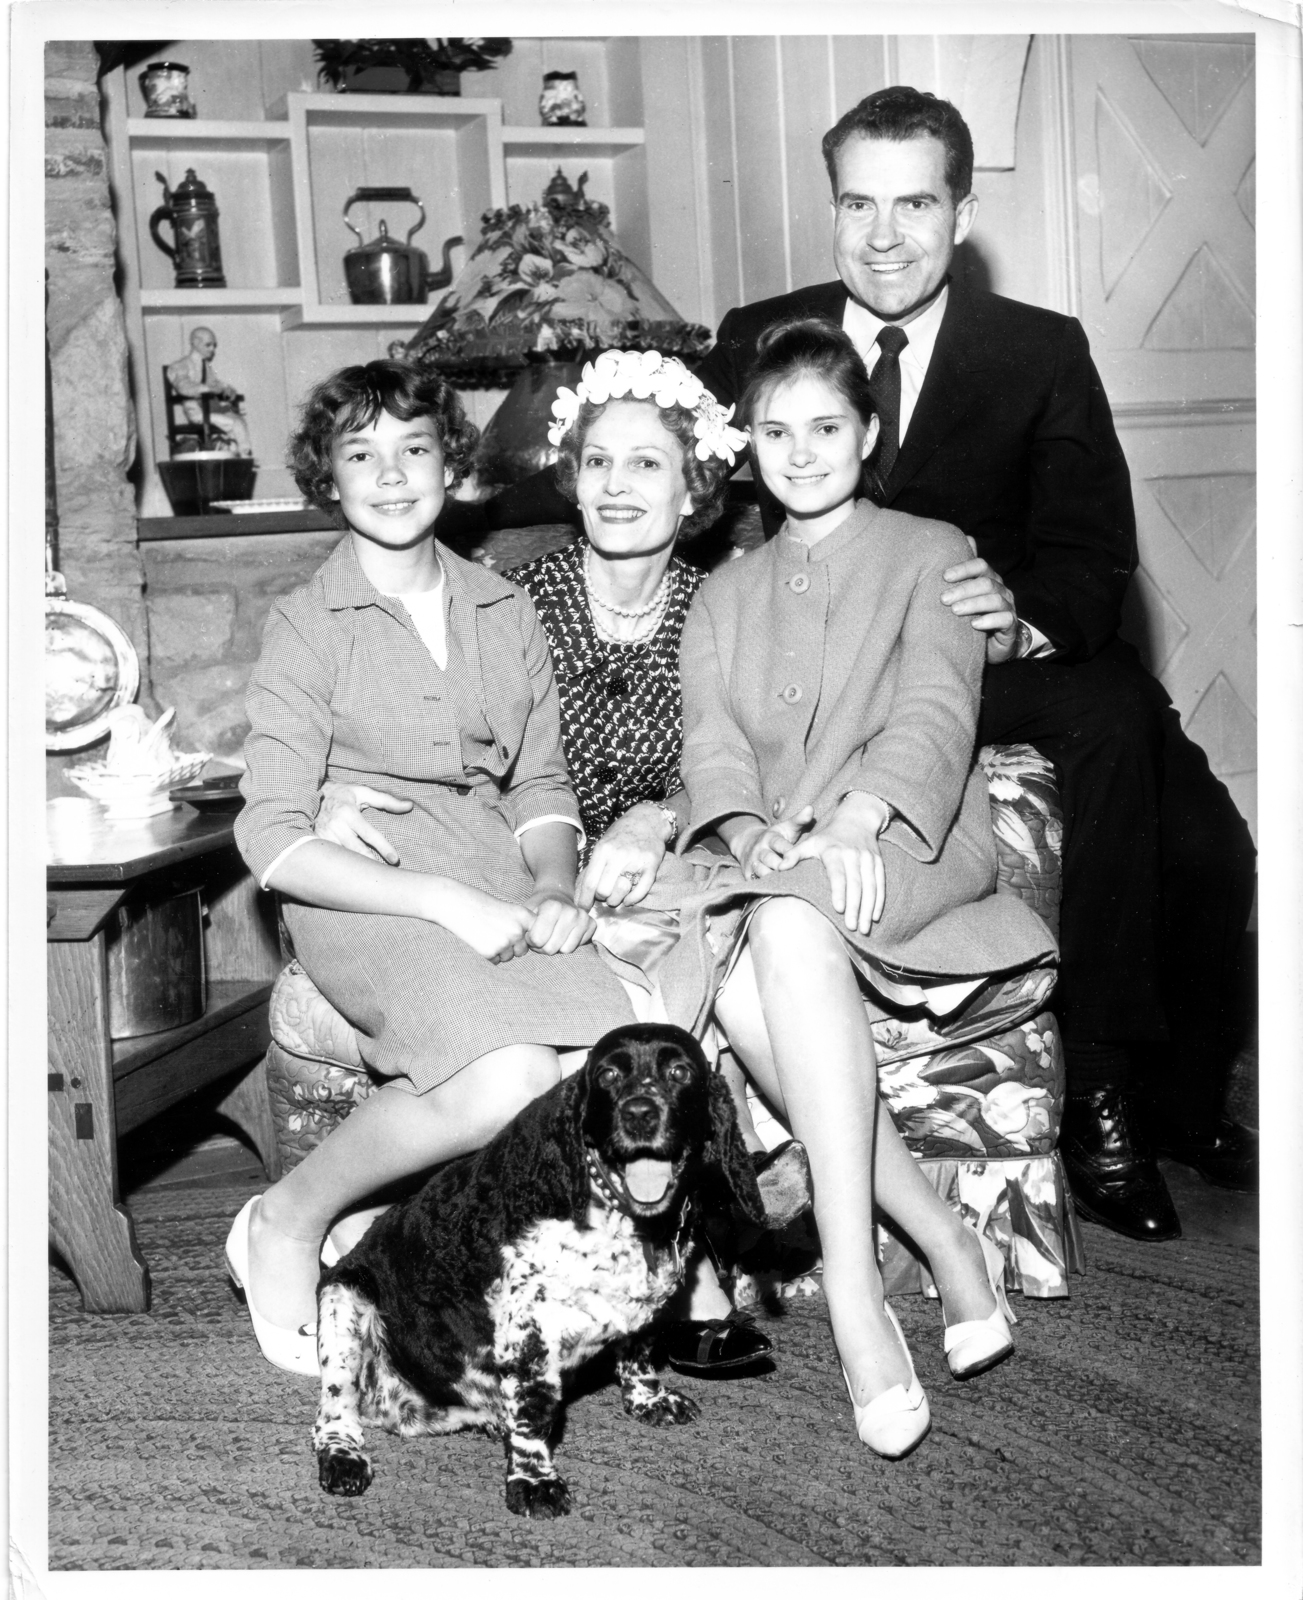 Pat Nixon By Pinterest: Living Room Portrait Of Richard Nixon, Pat Nixon, Tricia